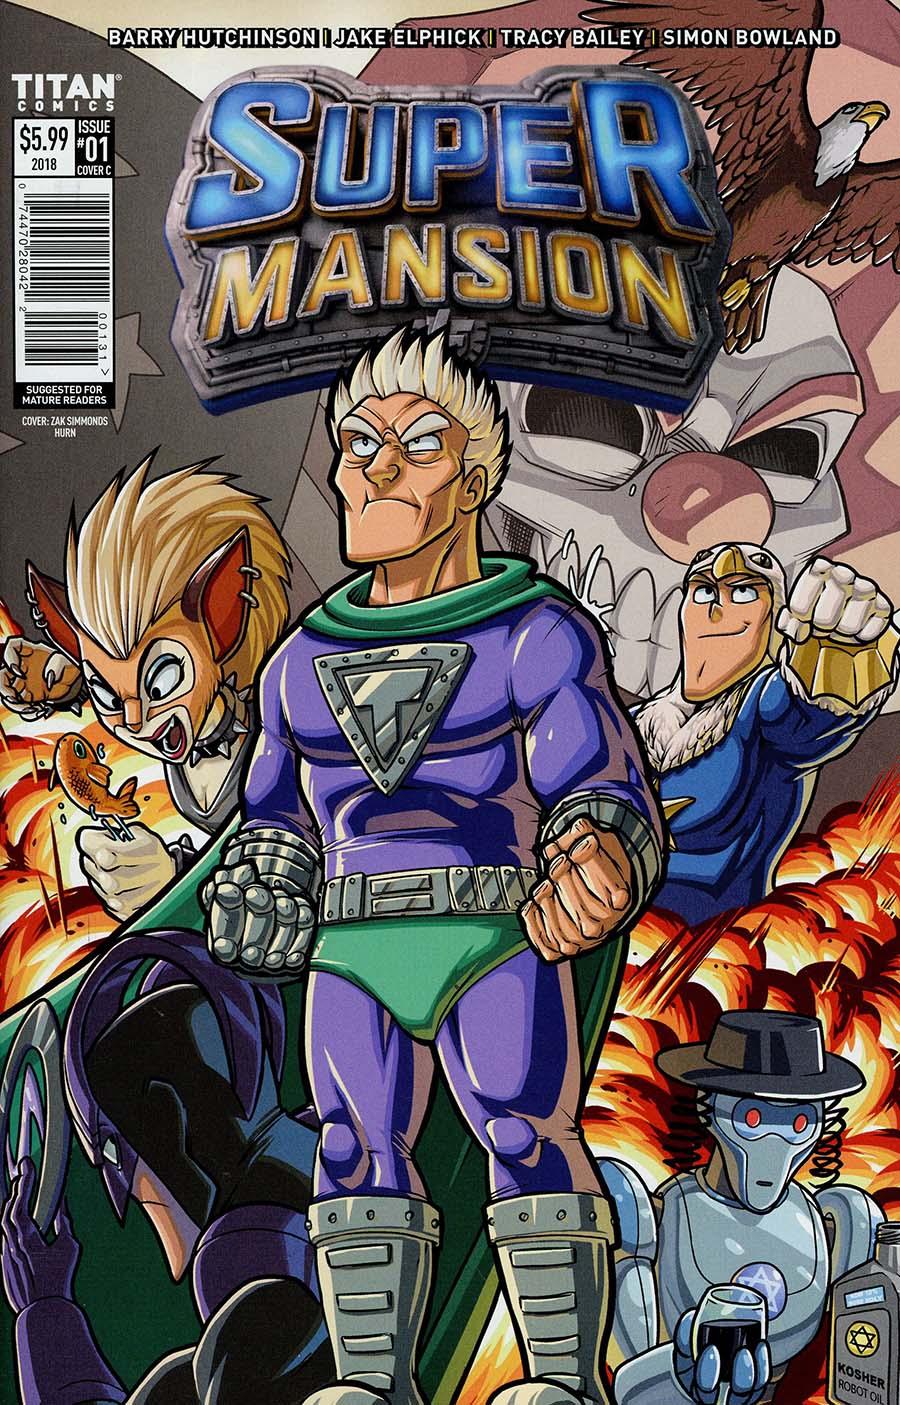 Supermansion #1 Cover C Variant Zak Simmonds Hurn Cover